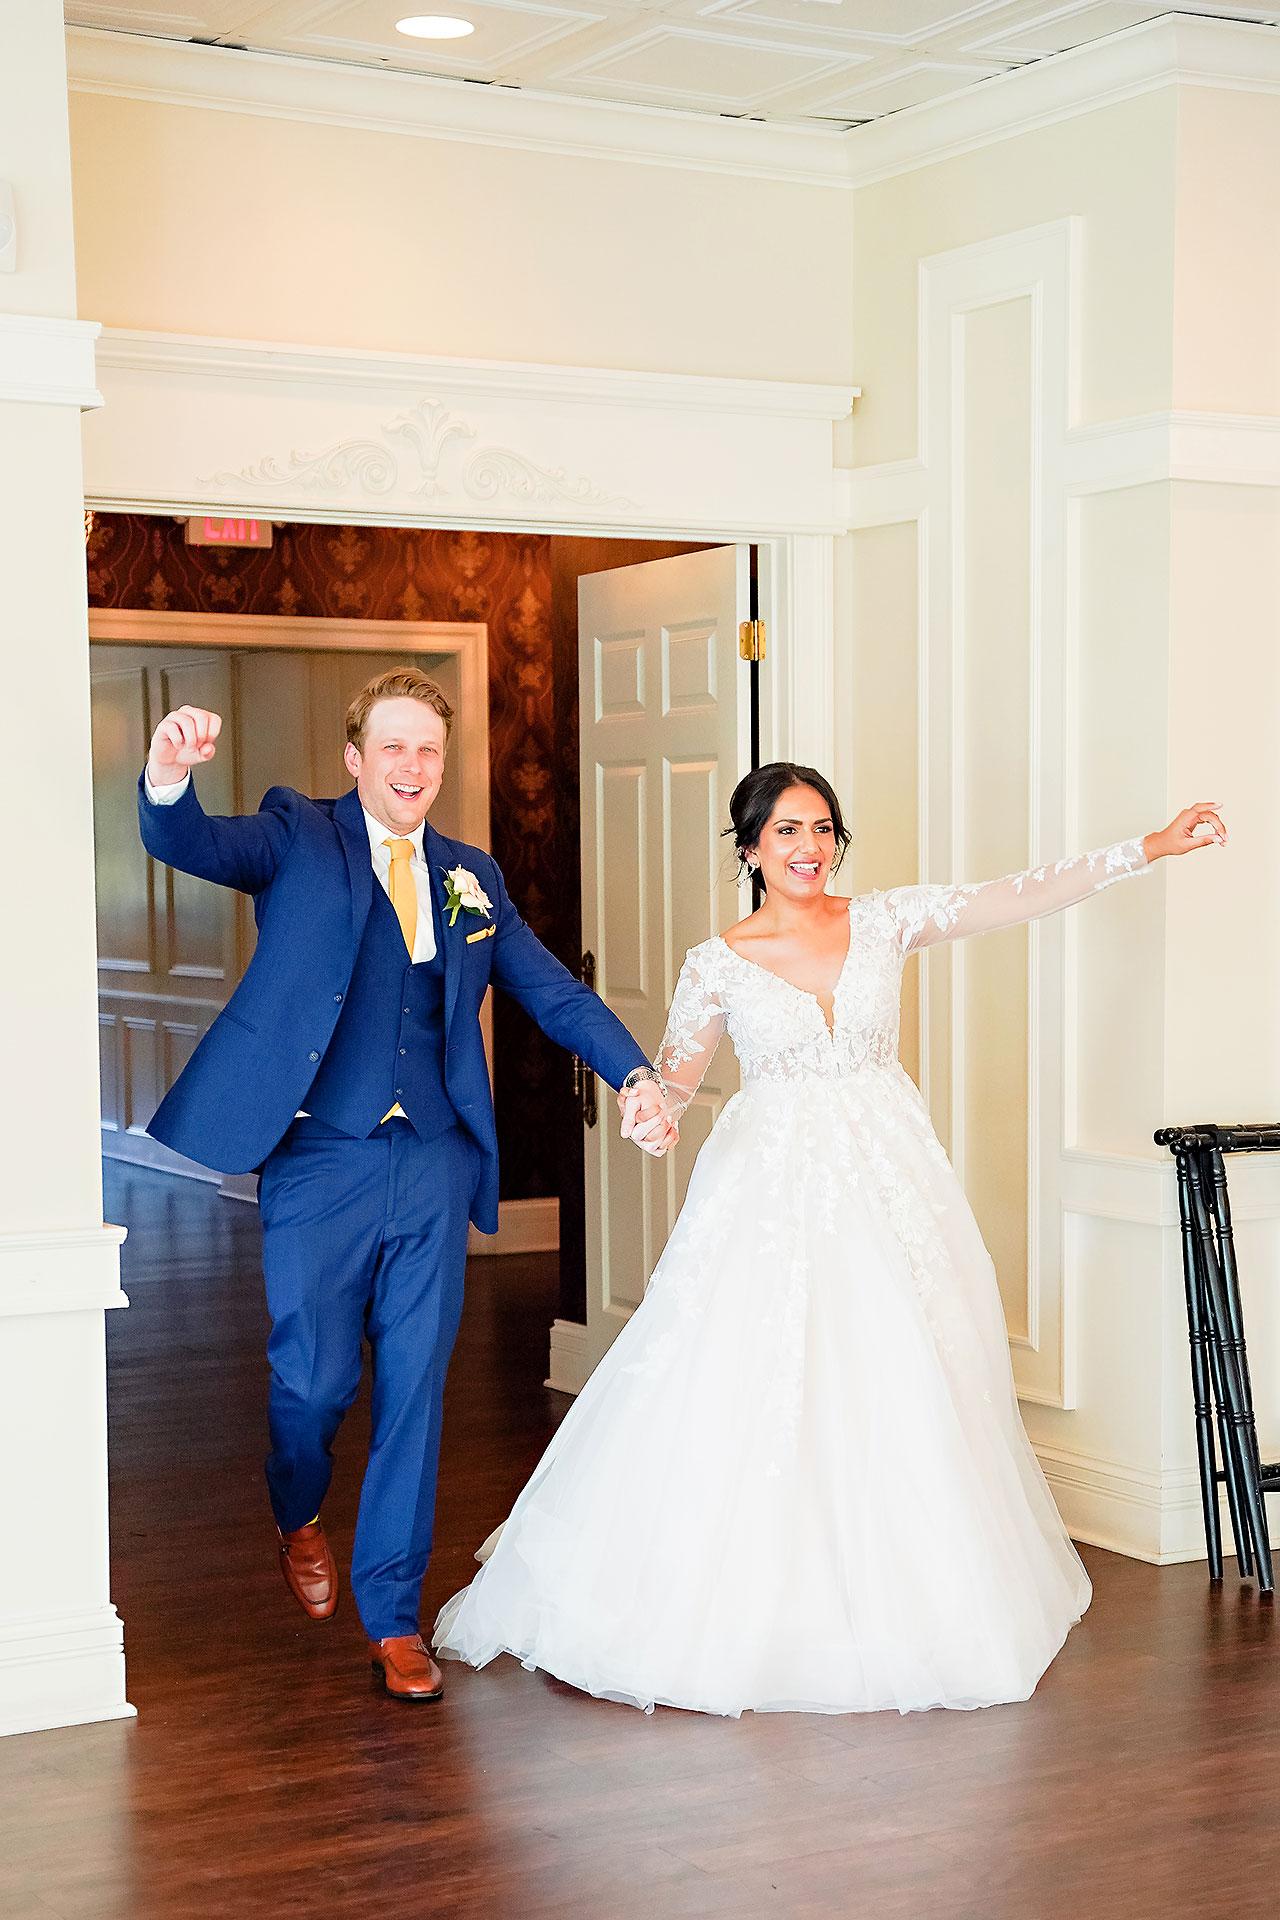 Nadia Parker Black Iris Estate Carmel Indiana Wedding May 2021 235